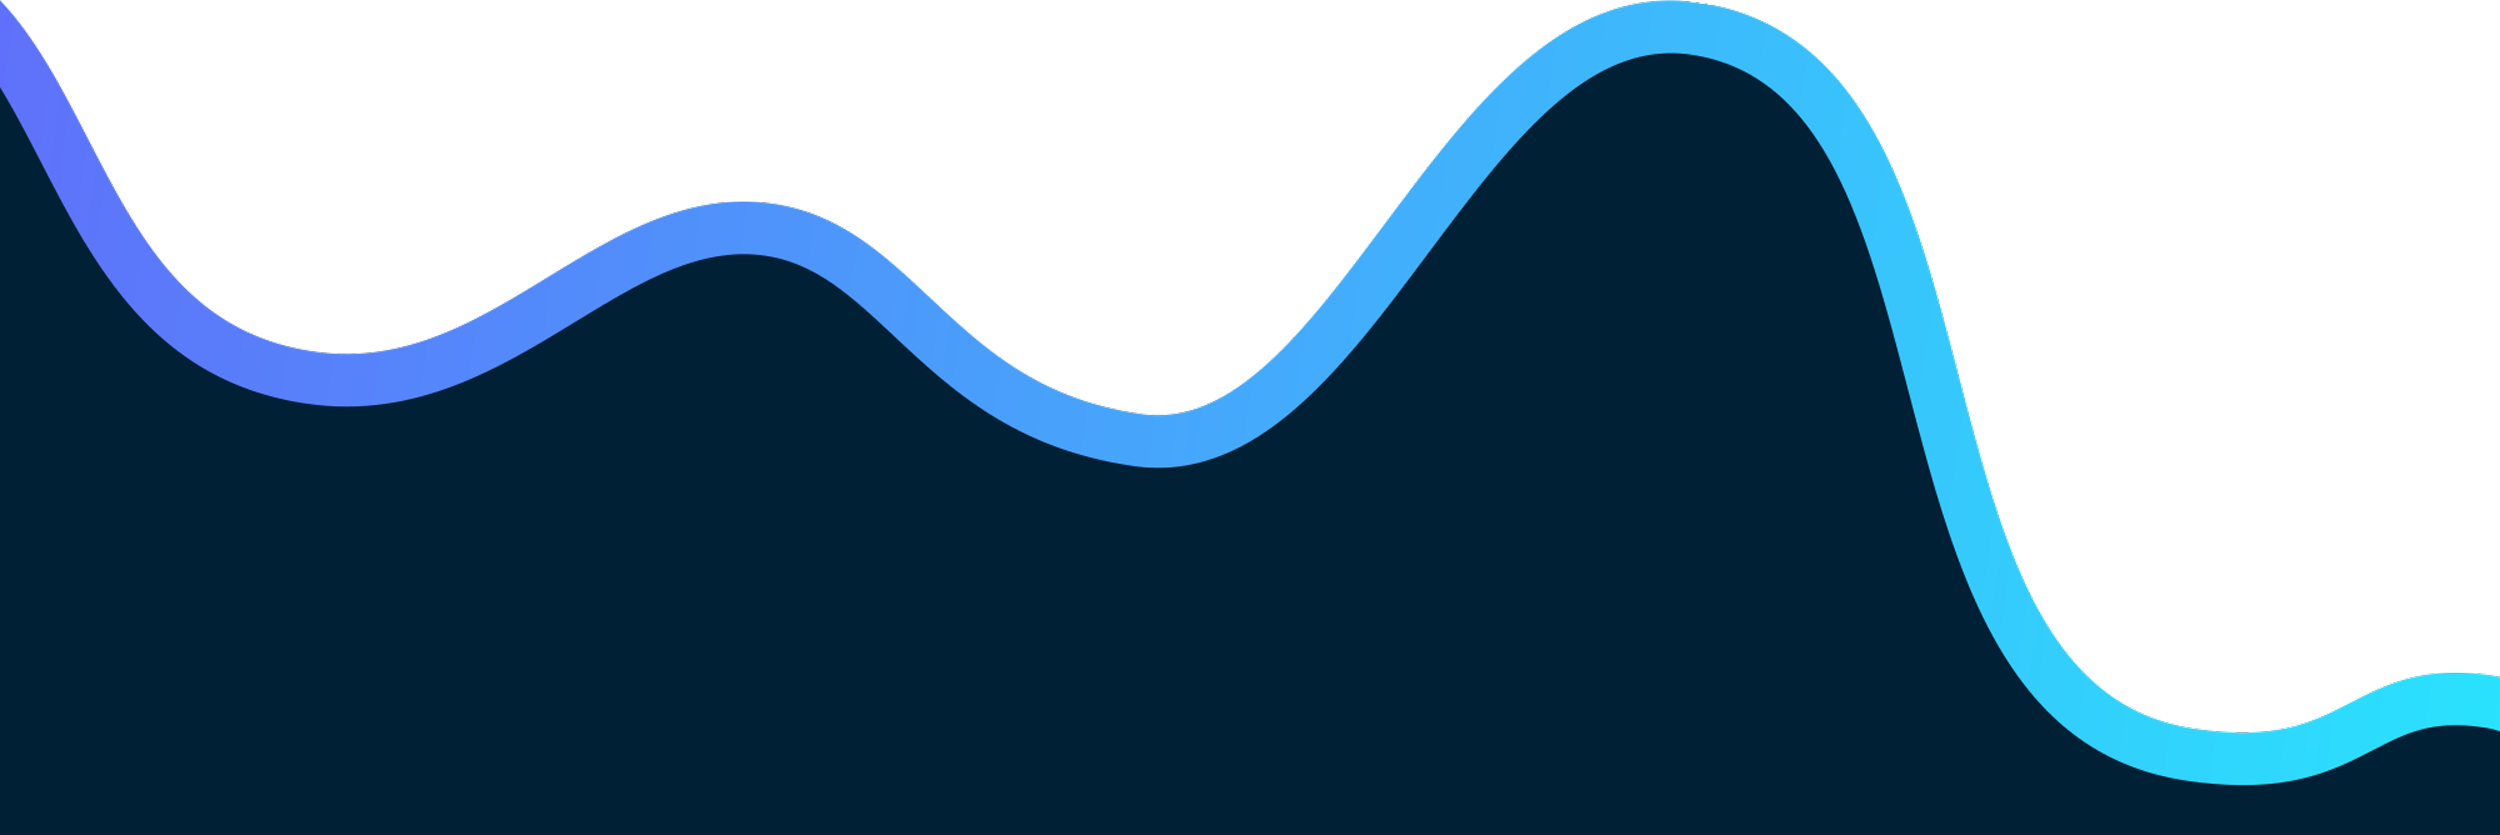 int-cmyreduce-curve